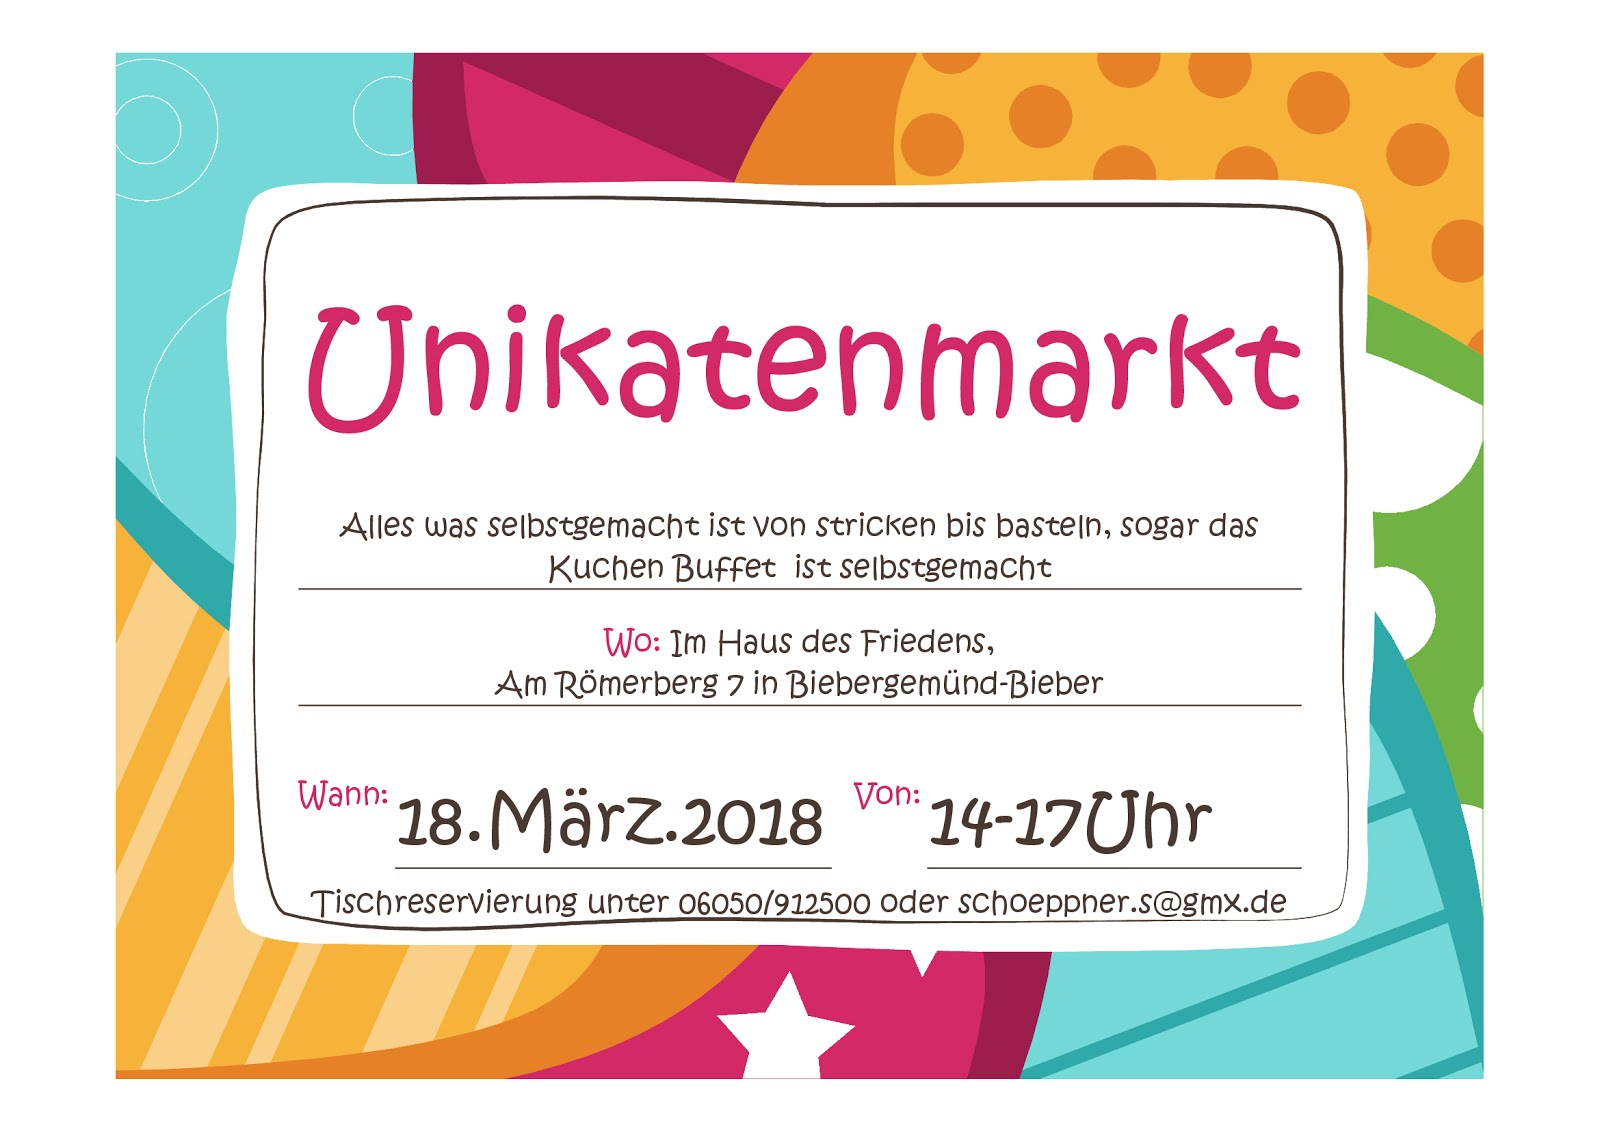 Unikatenmarkt 2018